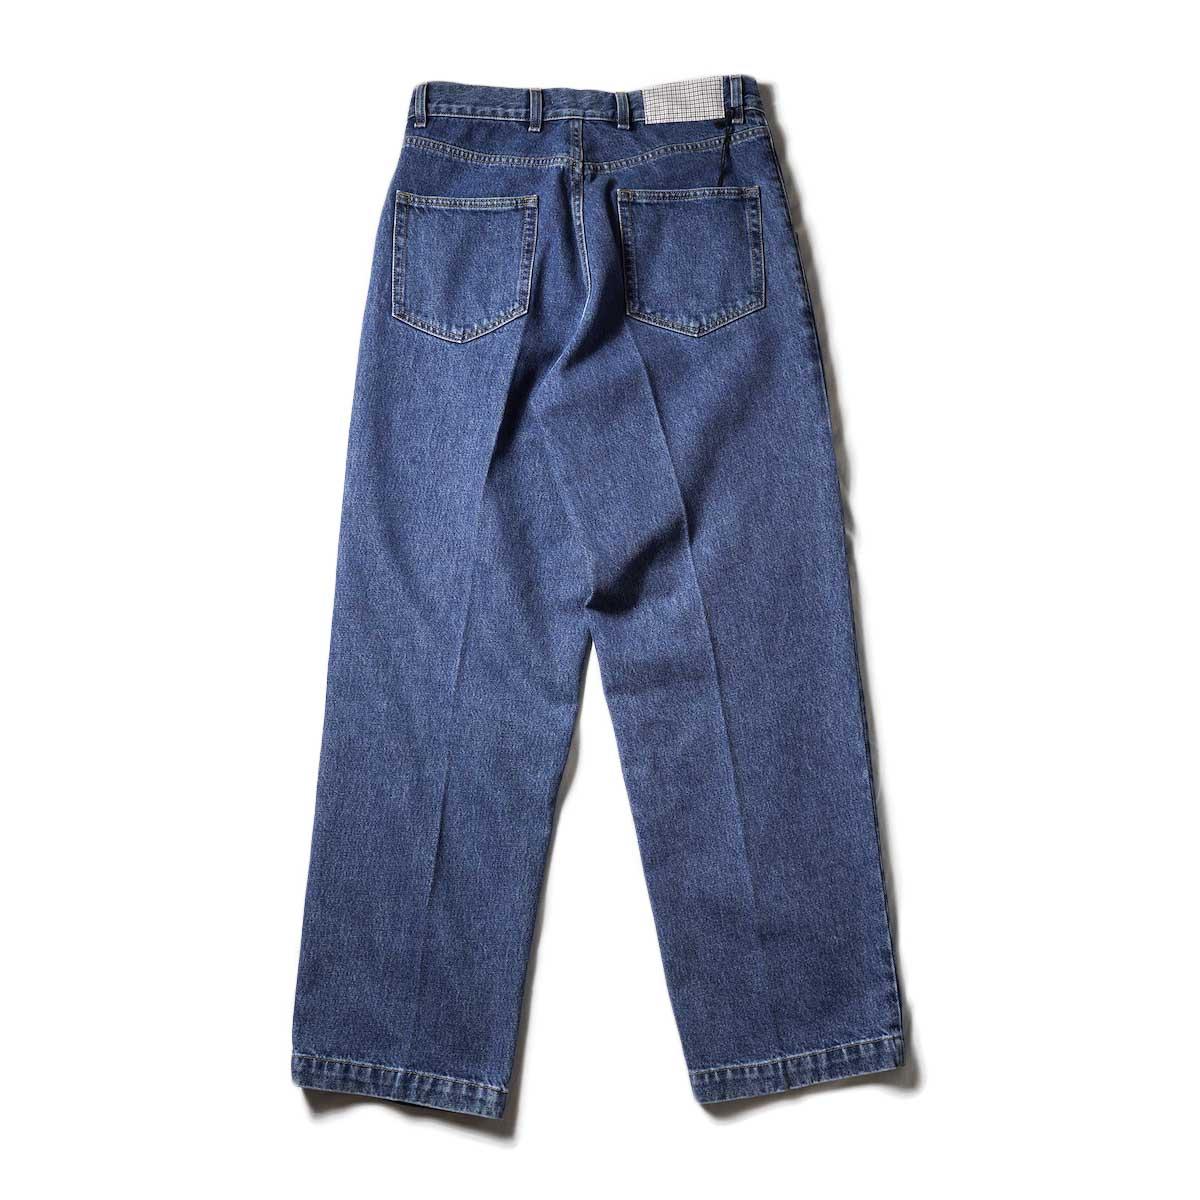 mfpen /BIG JEANS (Blue)背面